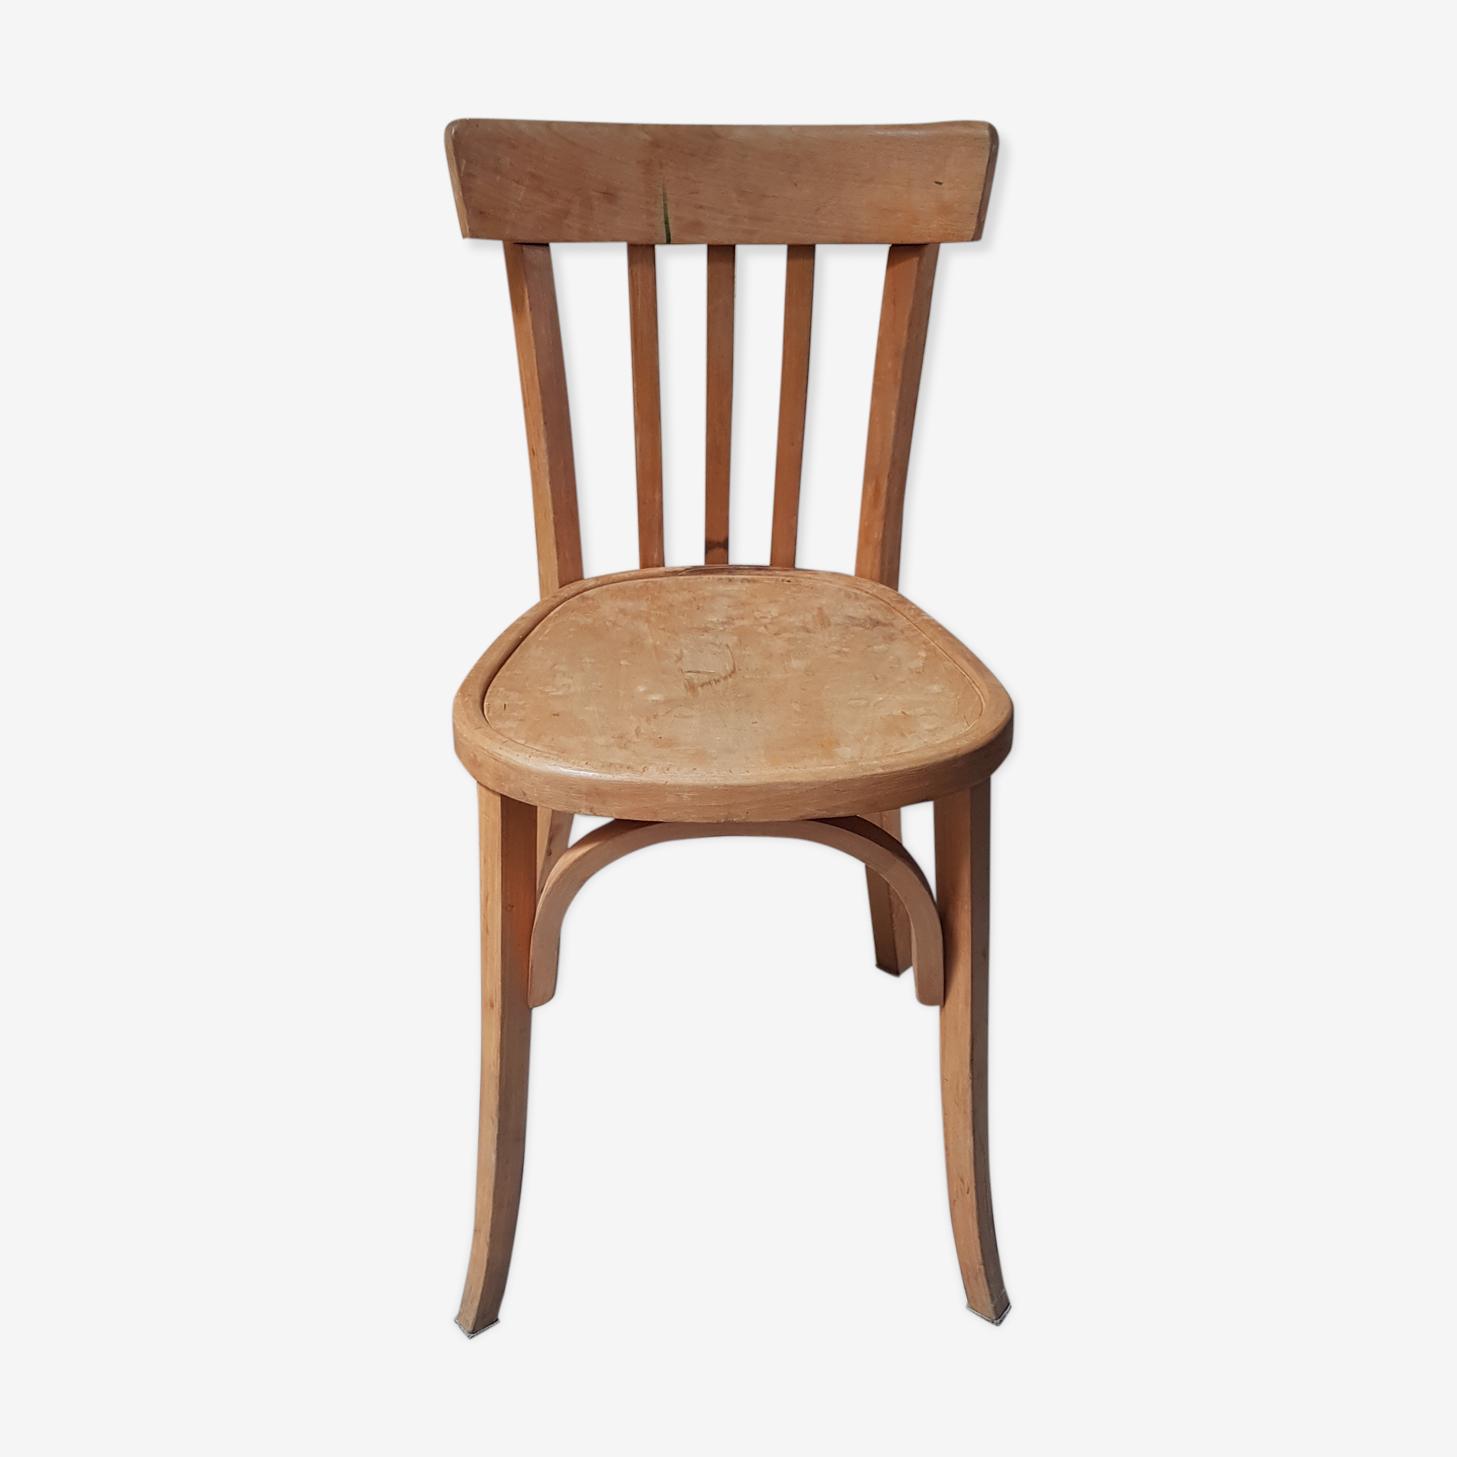 Ancienne chaise bistrot maison Gignez